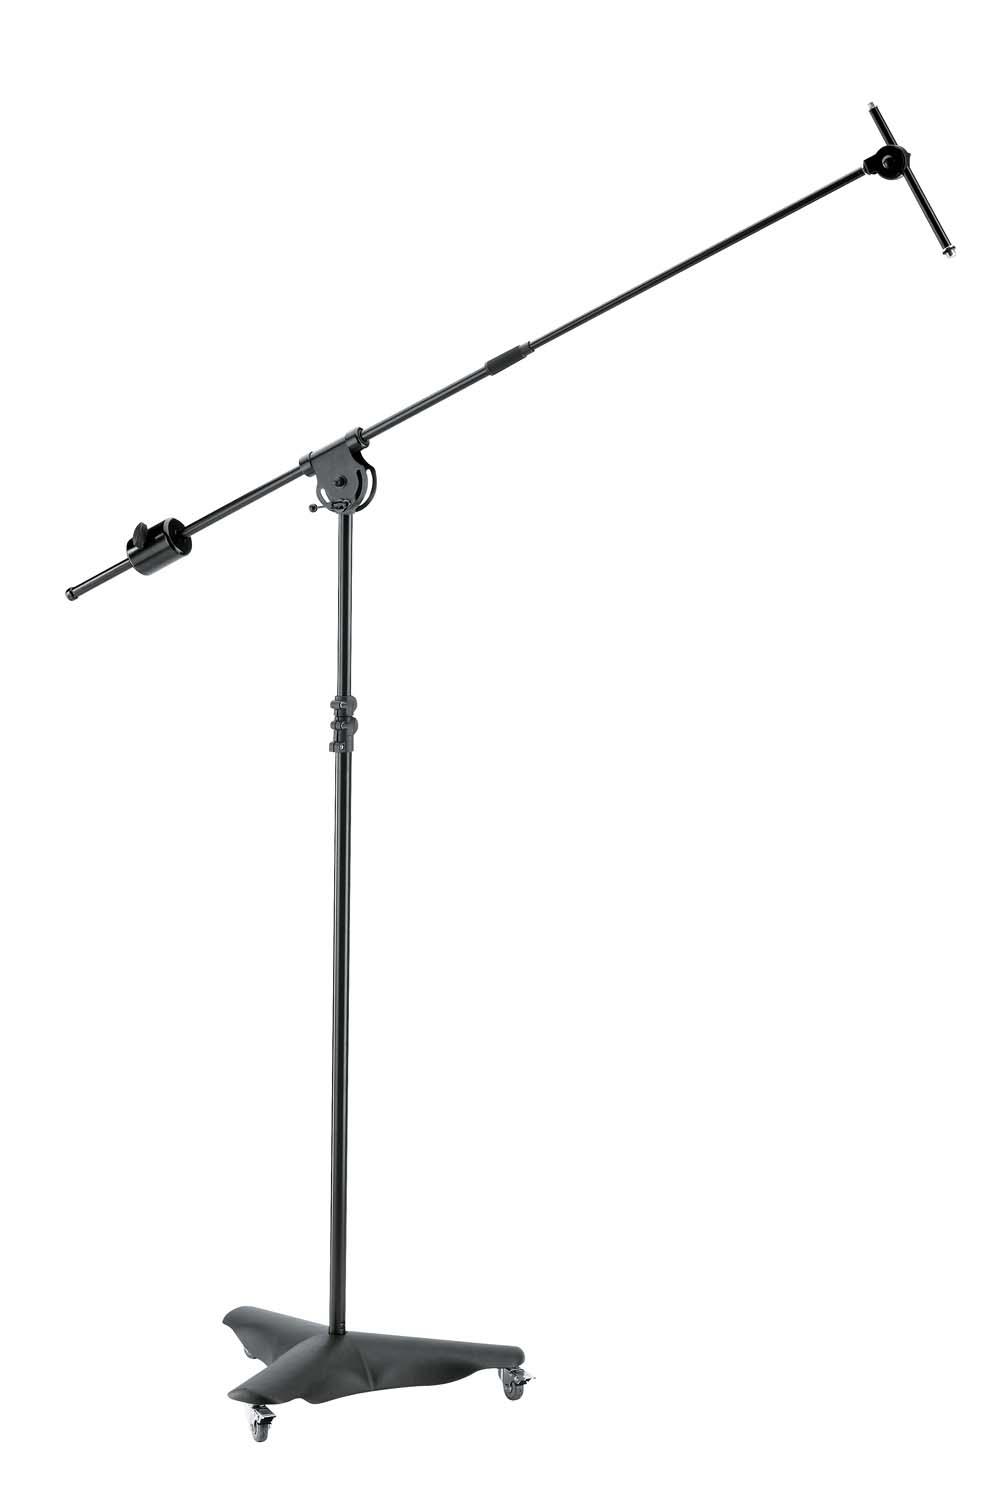 KM 21430 Overhead microphone stand